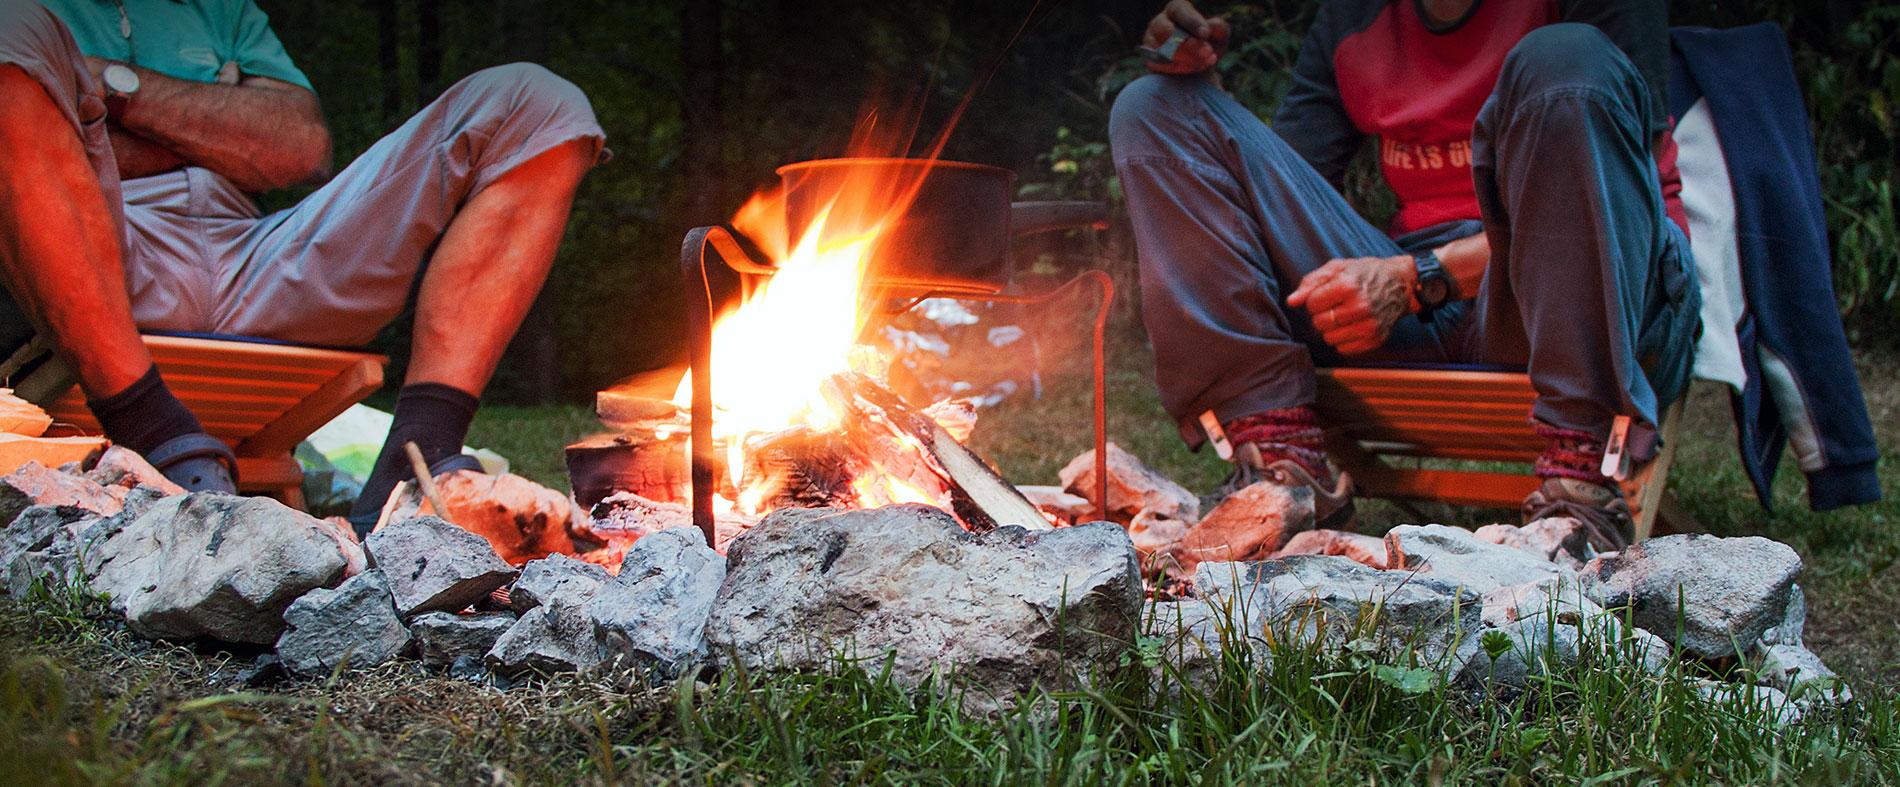 lightbox-camping-saignelegier-camping2